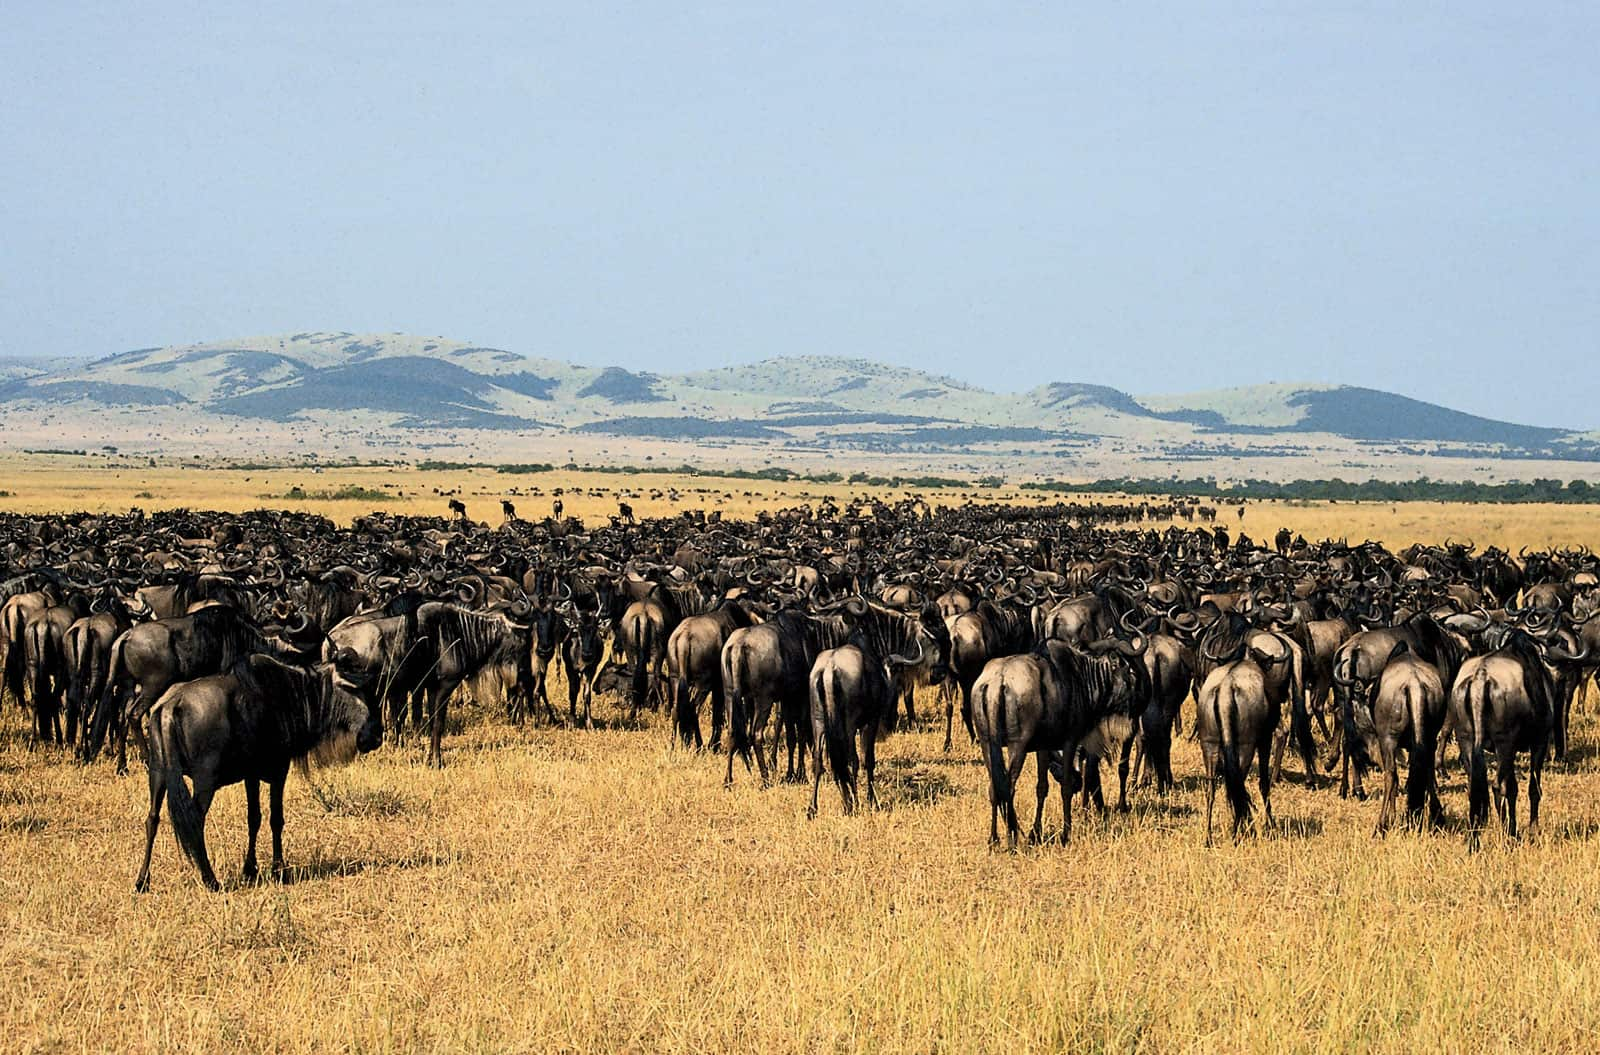 Herd Gnu Tanzania Serengeti National Park